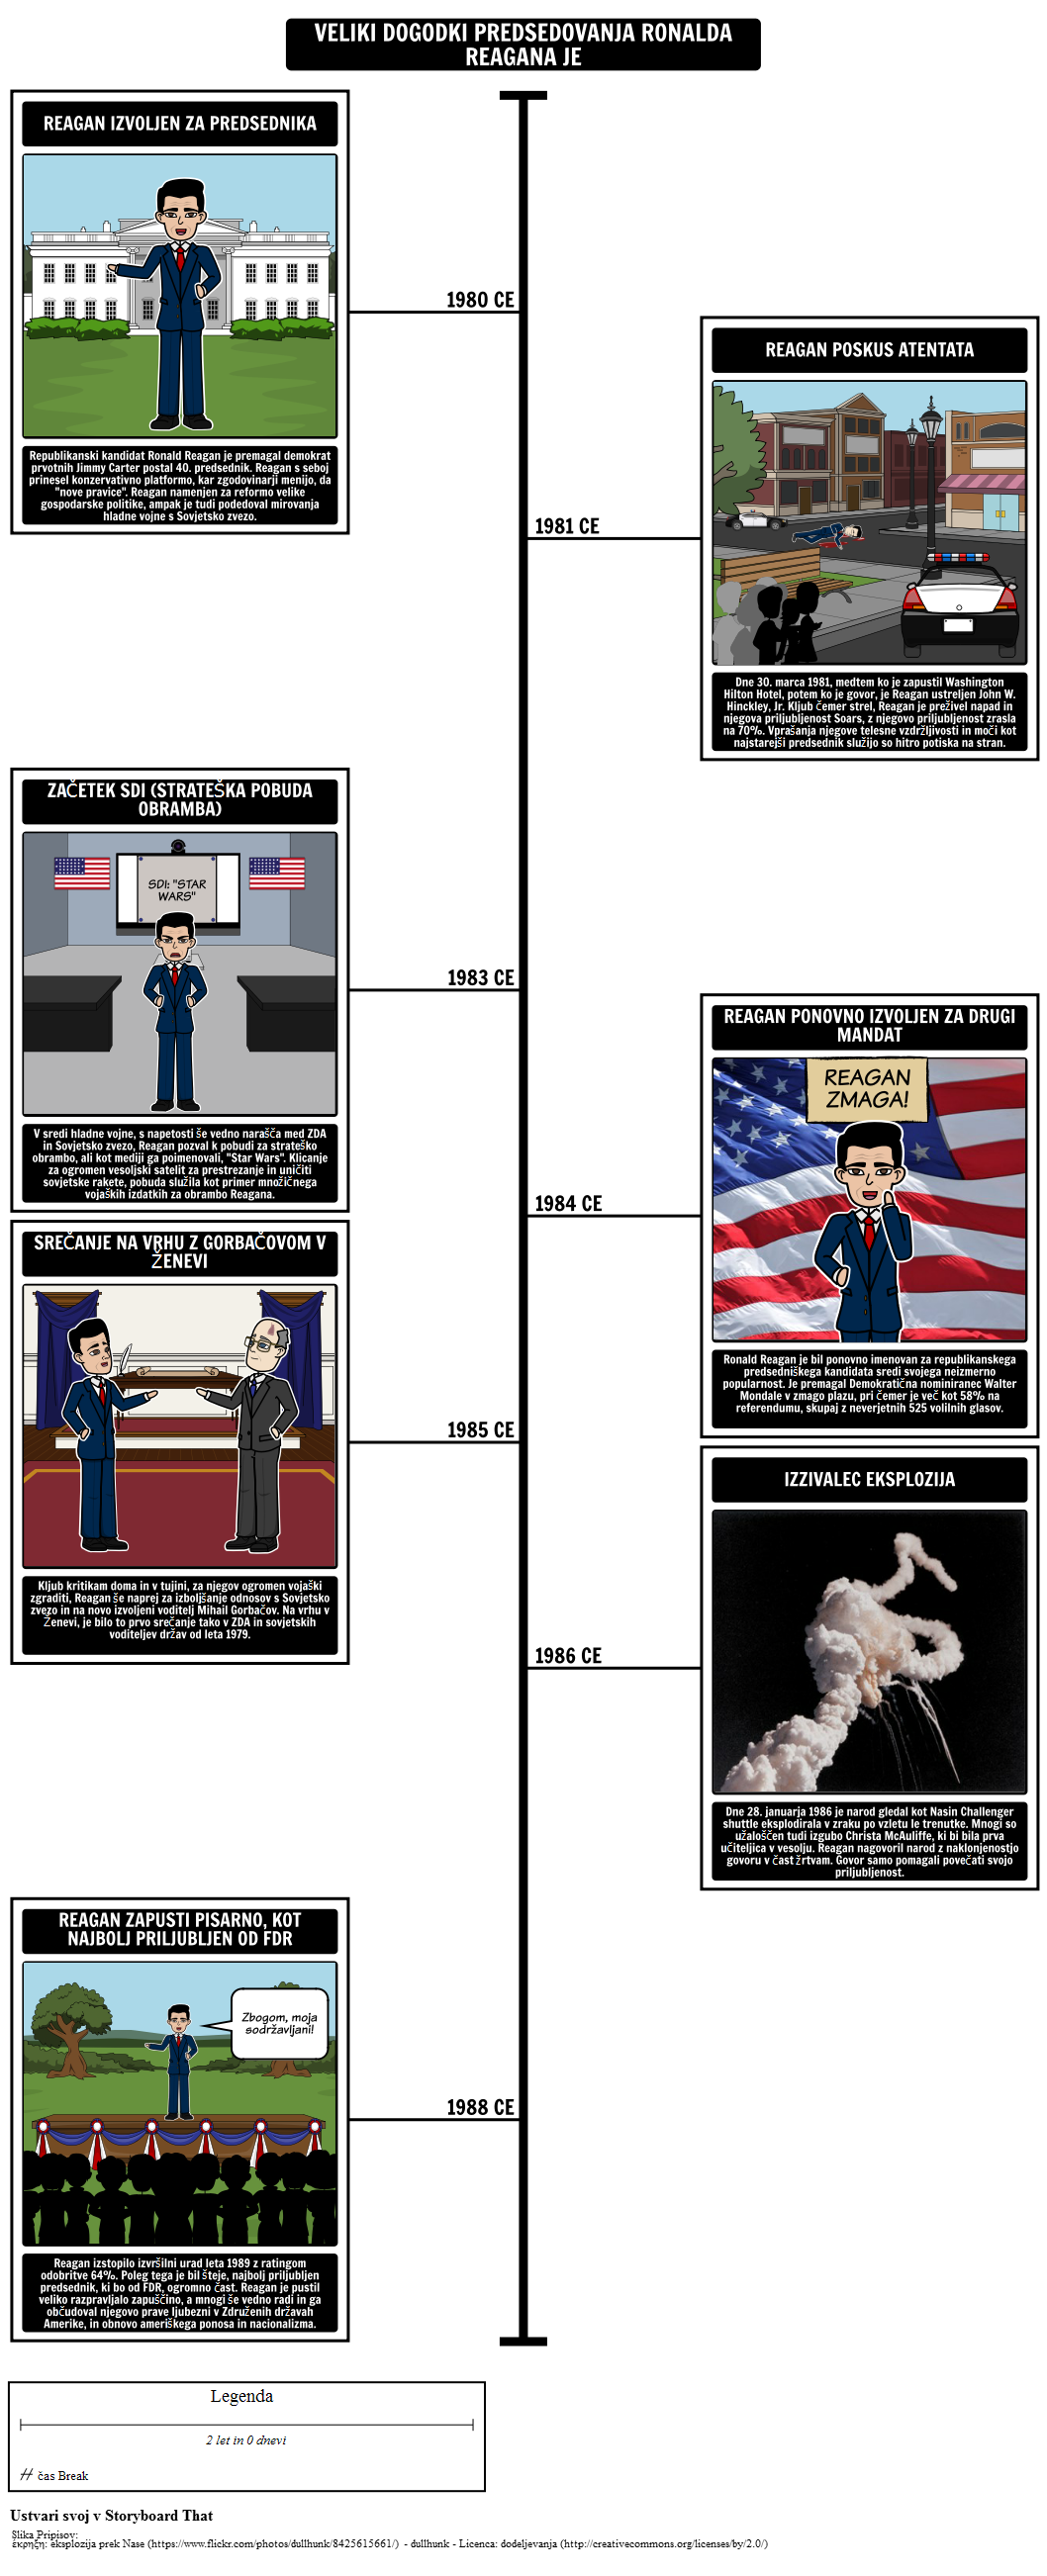 Reagan Predsedstvo Timeline